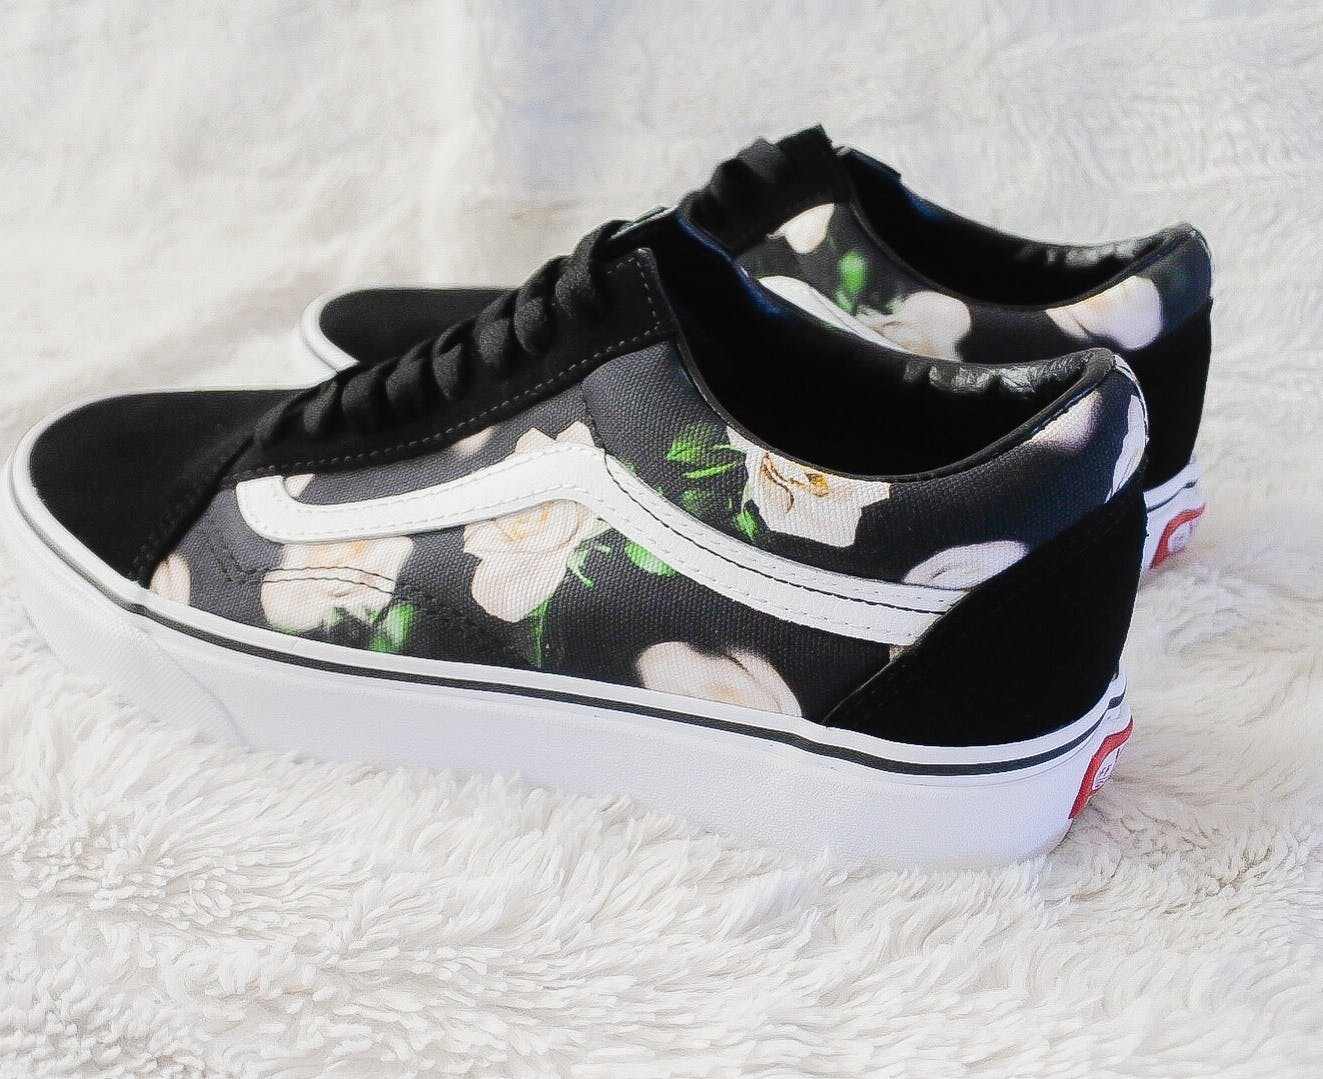 Kup Vans Ua Old Skool (romantic Floral) Blackt czarny Buty